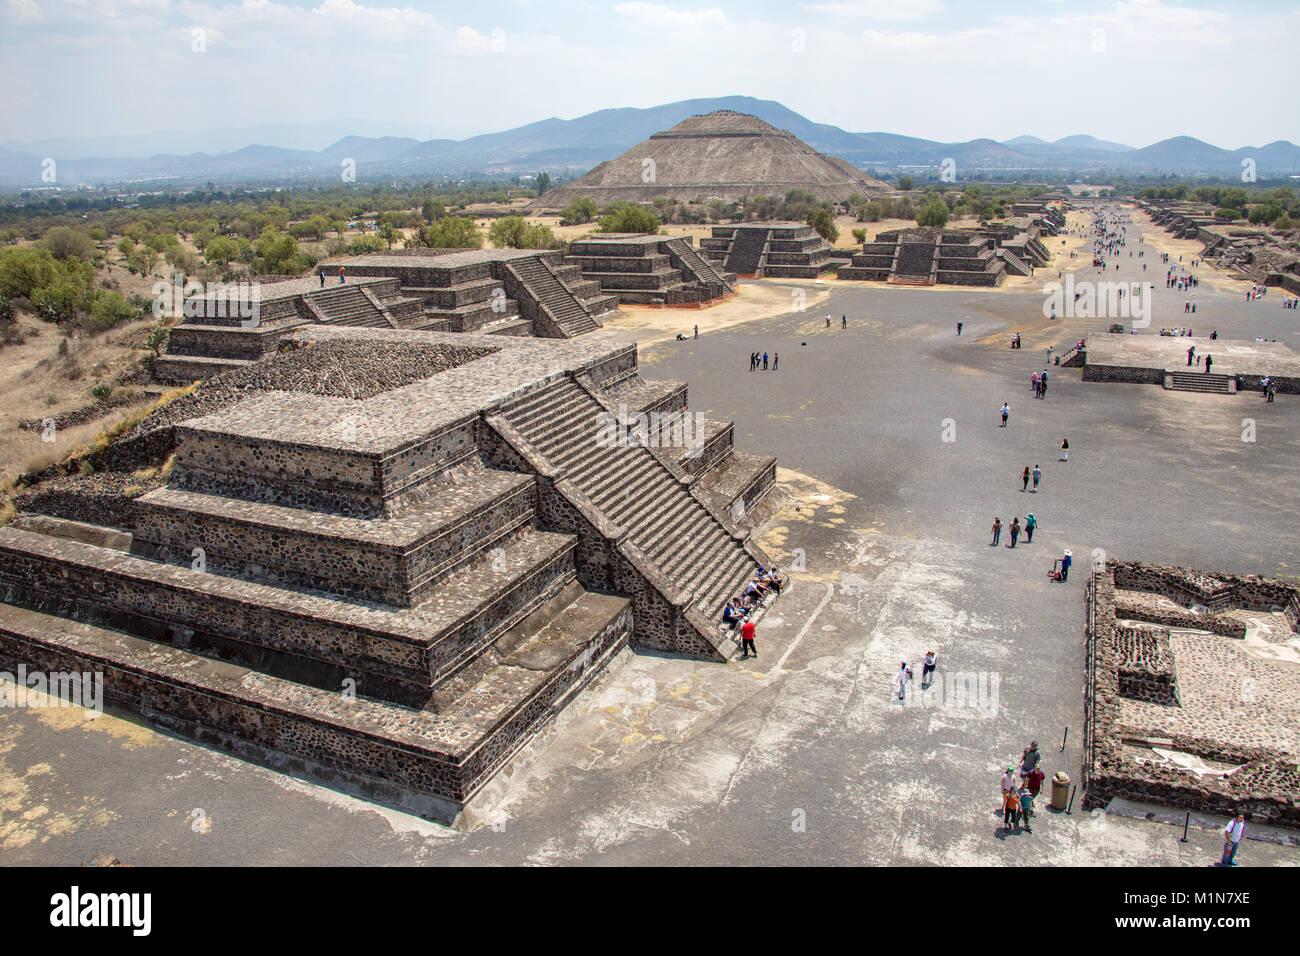 Pyramide du soleil, Teotihuacán, Mexico, Mexique Photo Stock